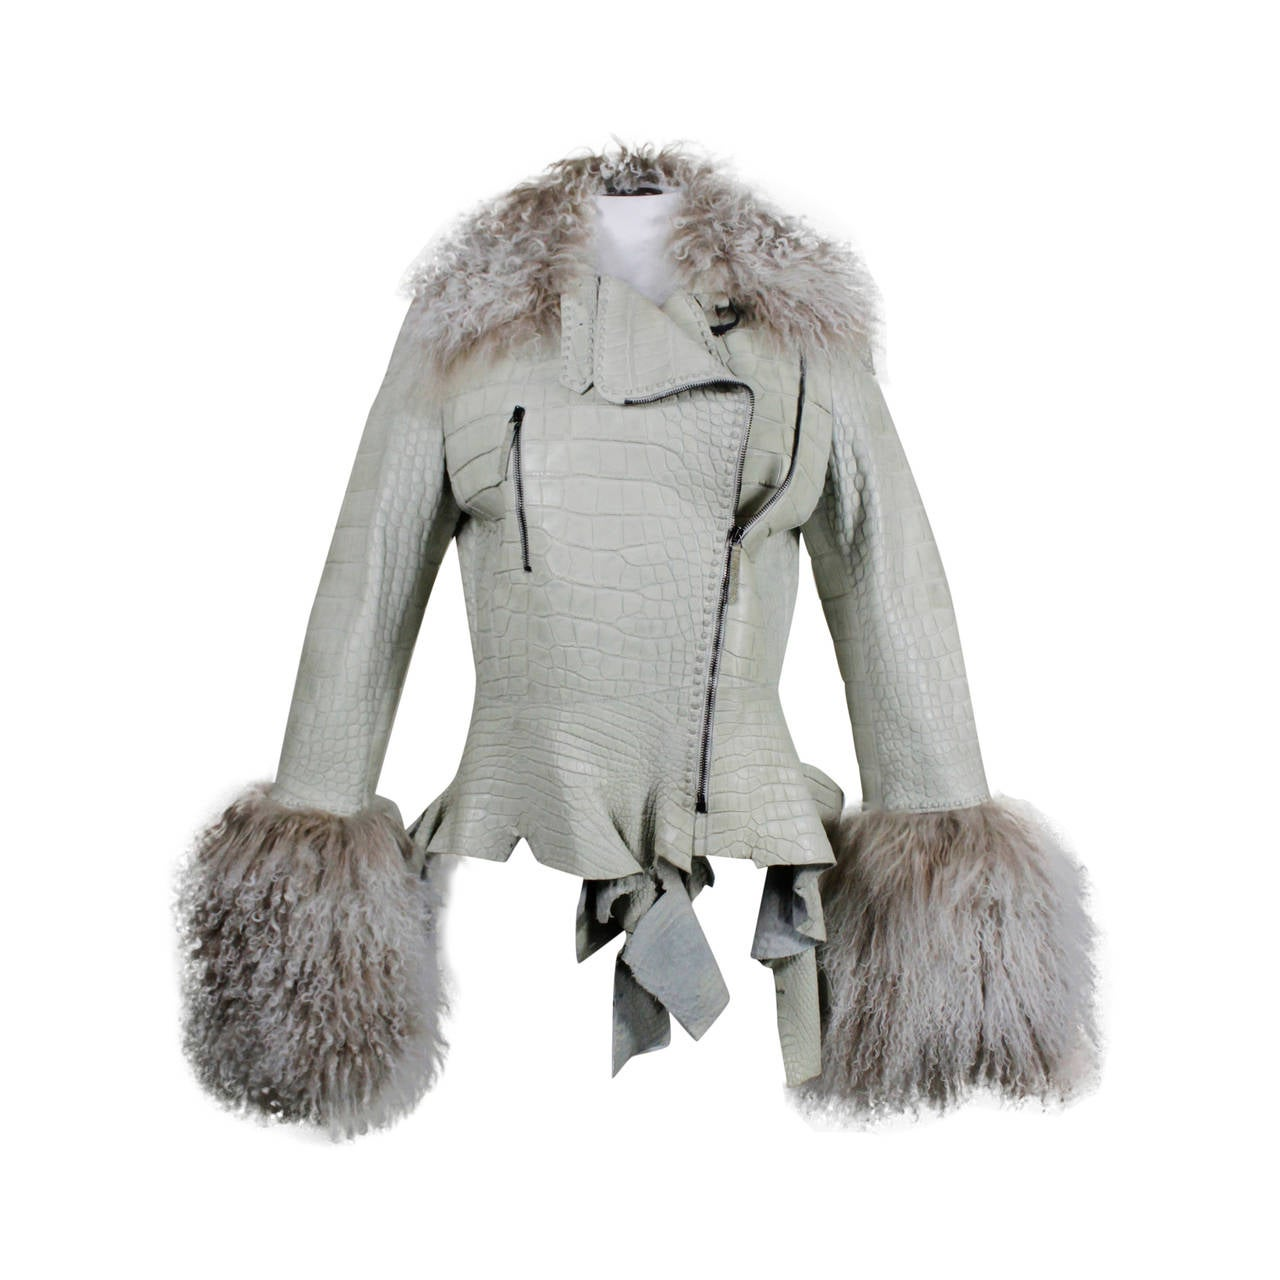 Ungaro Embossed Leather Moto Jacket with Mongolian Fur Trim at 1stdibs